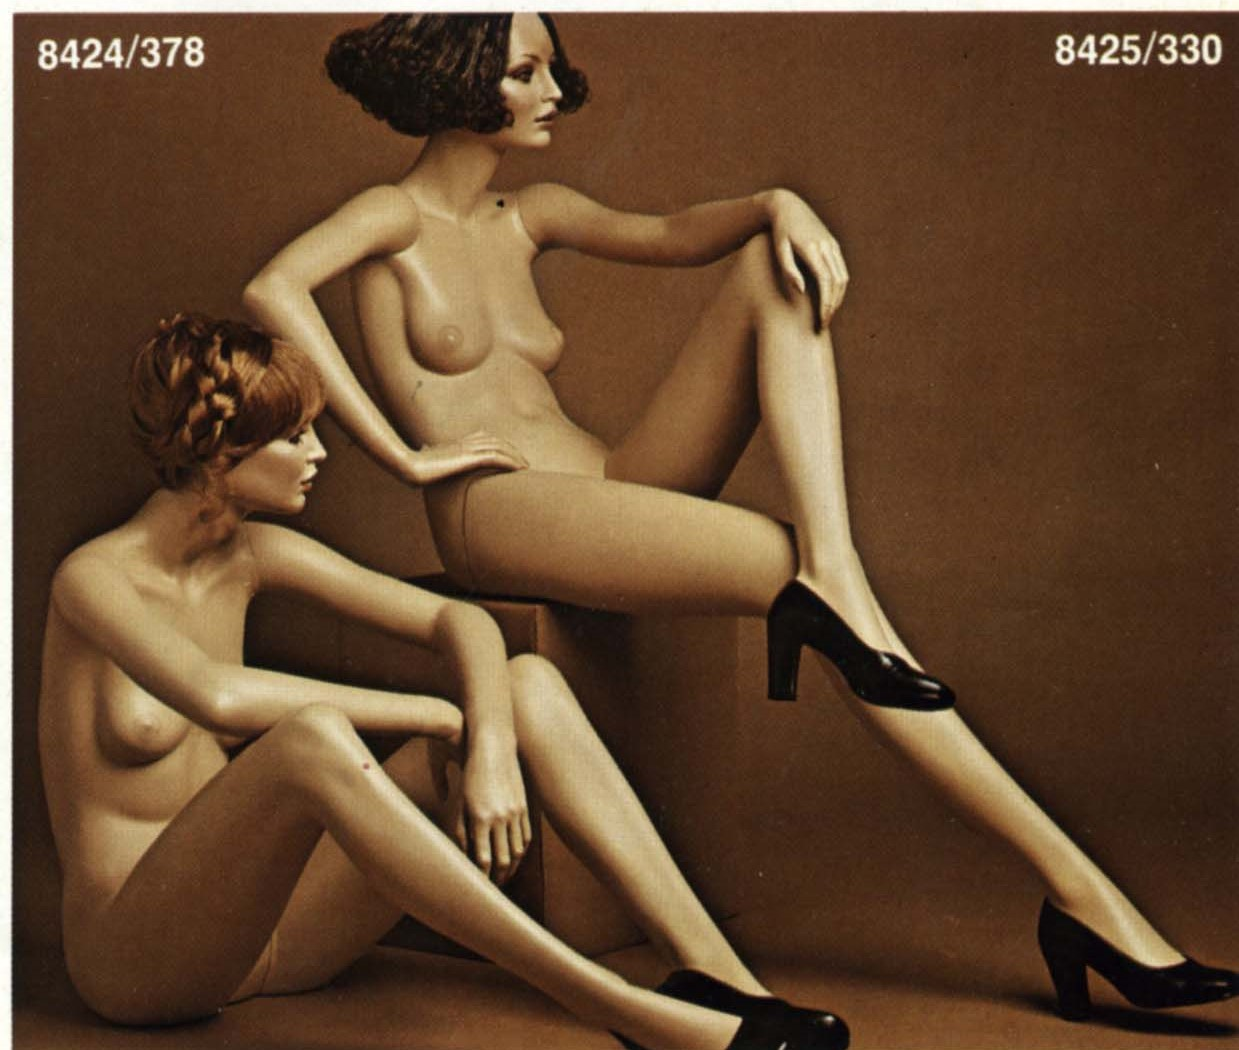 Katalog Young Look (Danny Letton) 01 - Kopie2.jpg